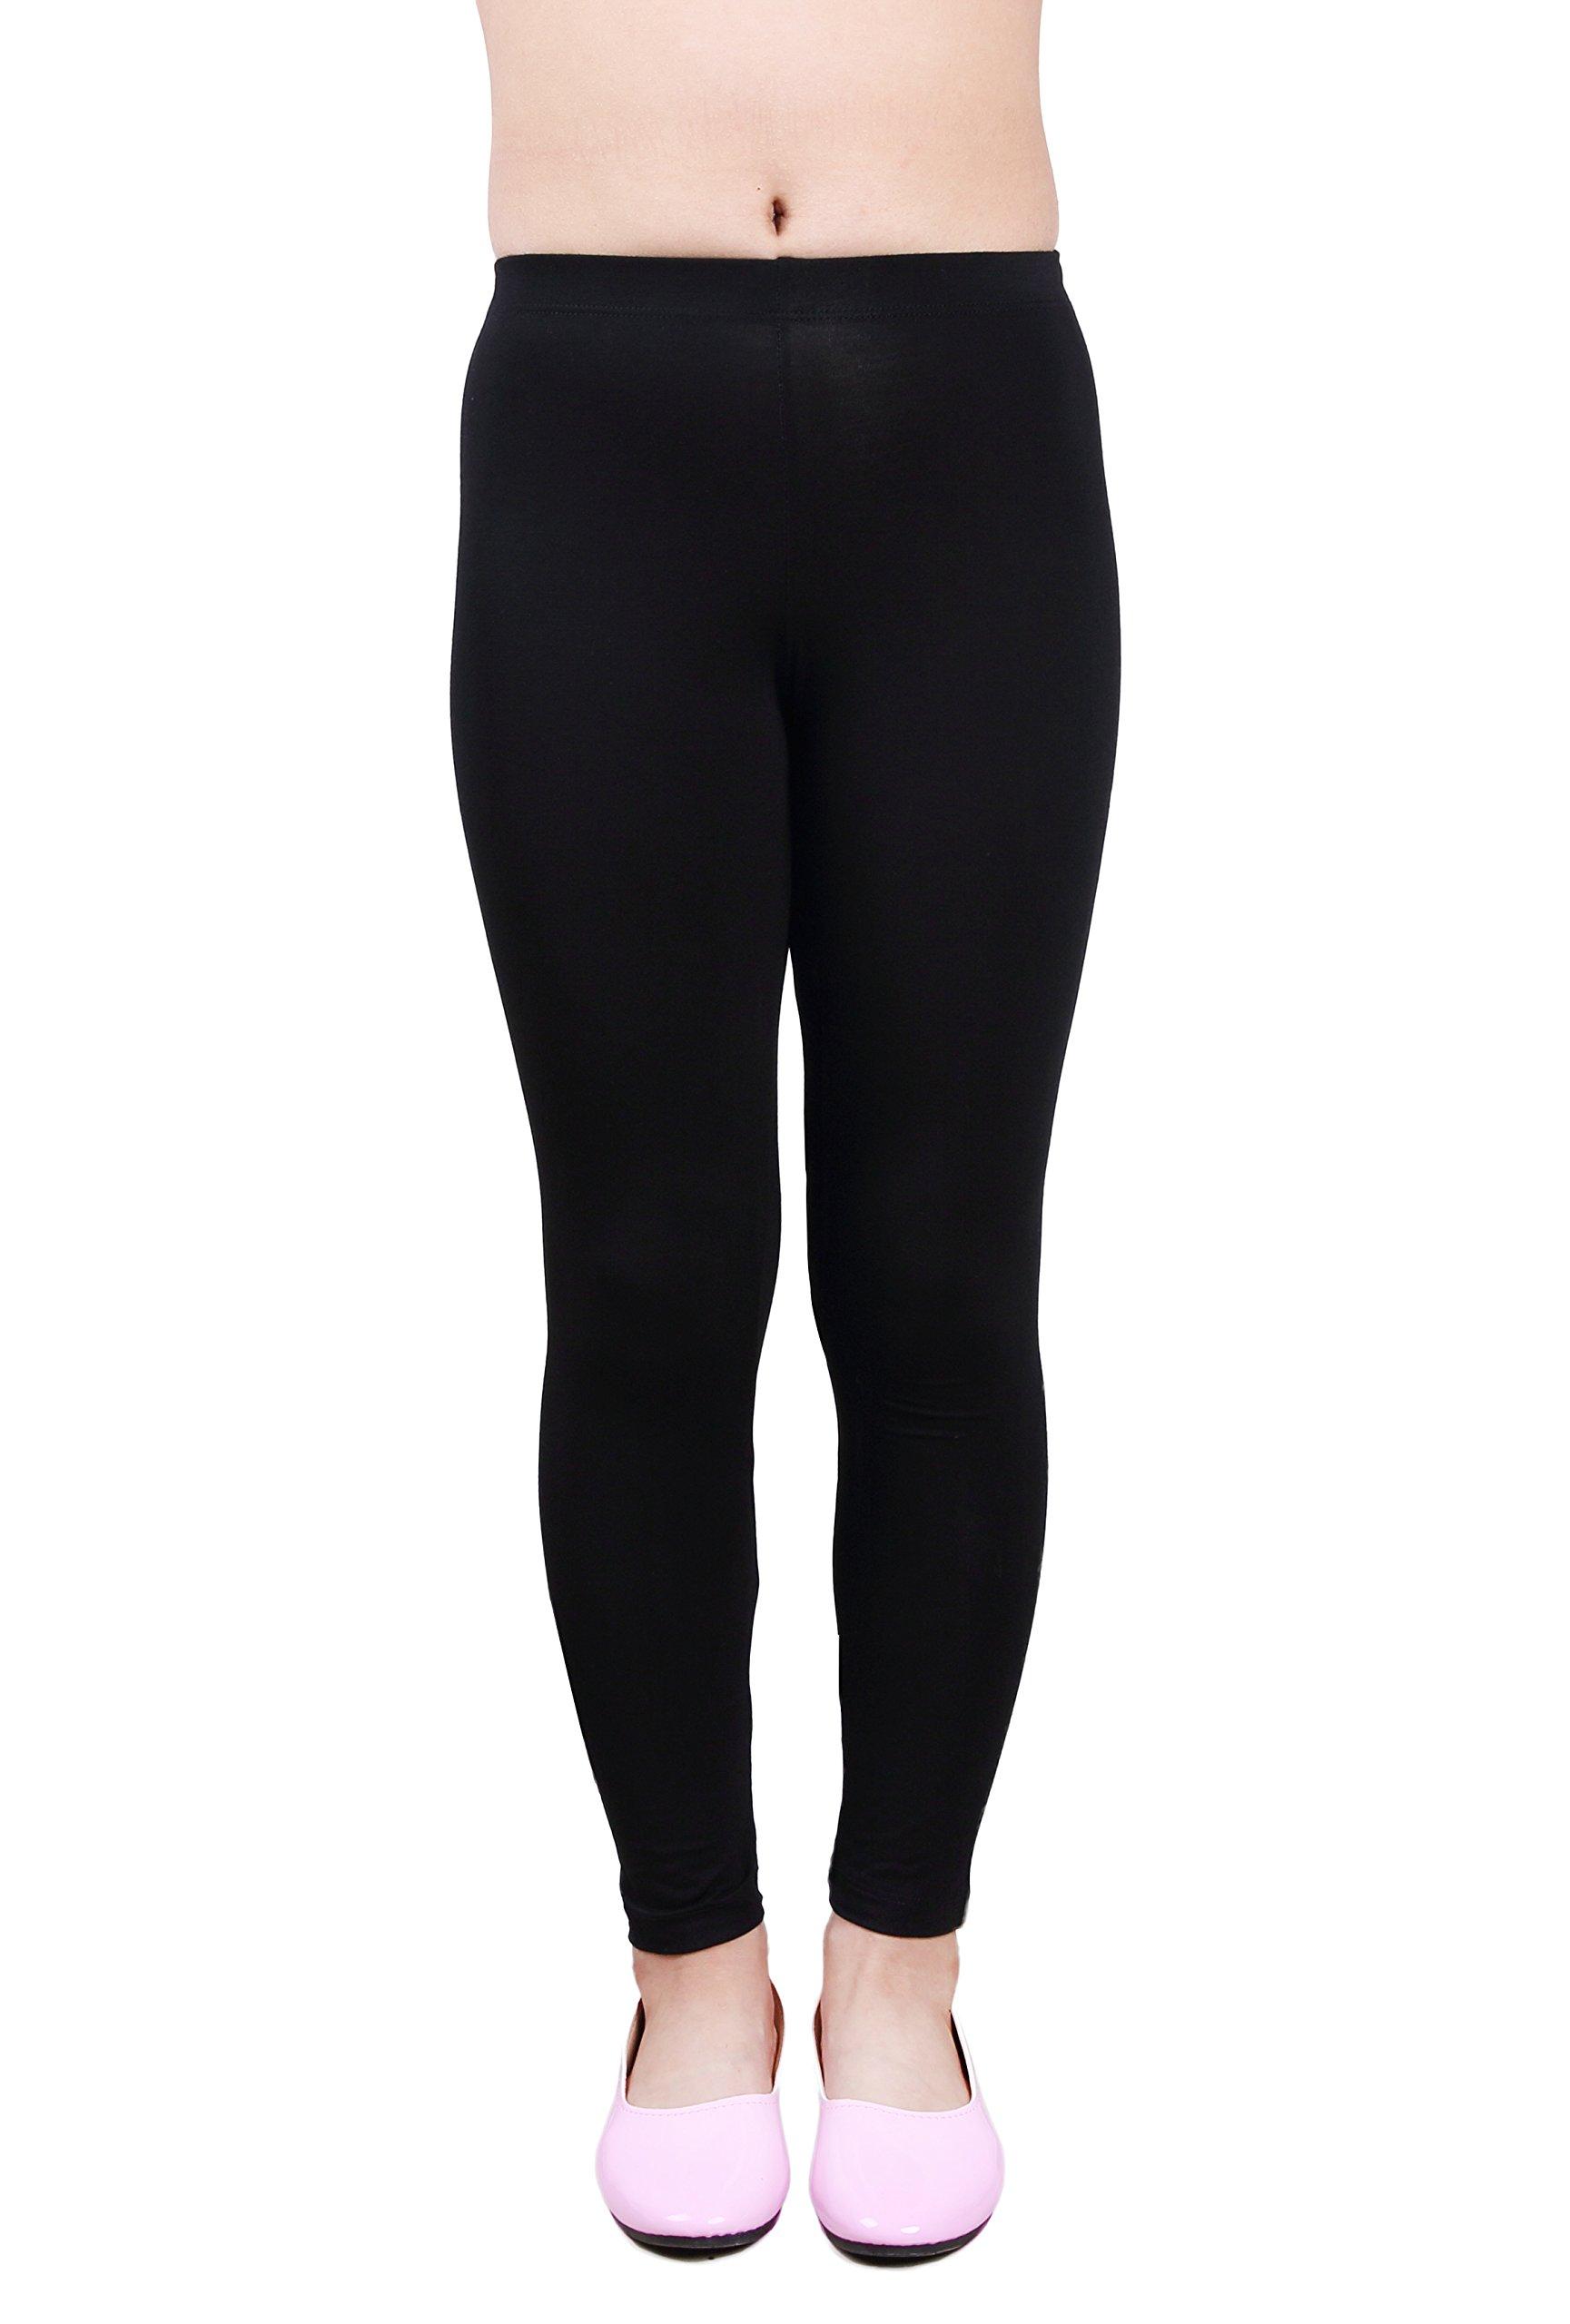 IRELIA Girls Modal Solid Active Leggings Black M